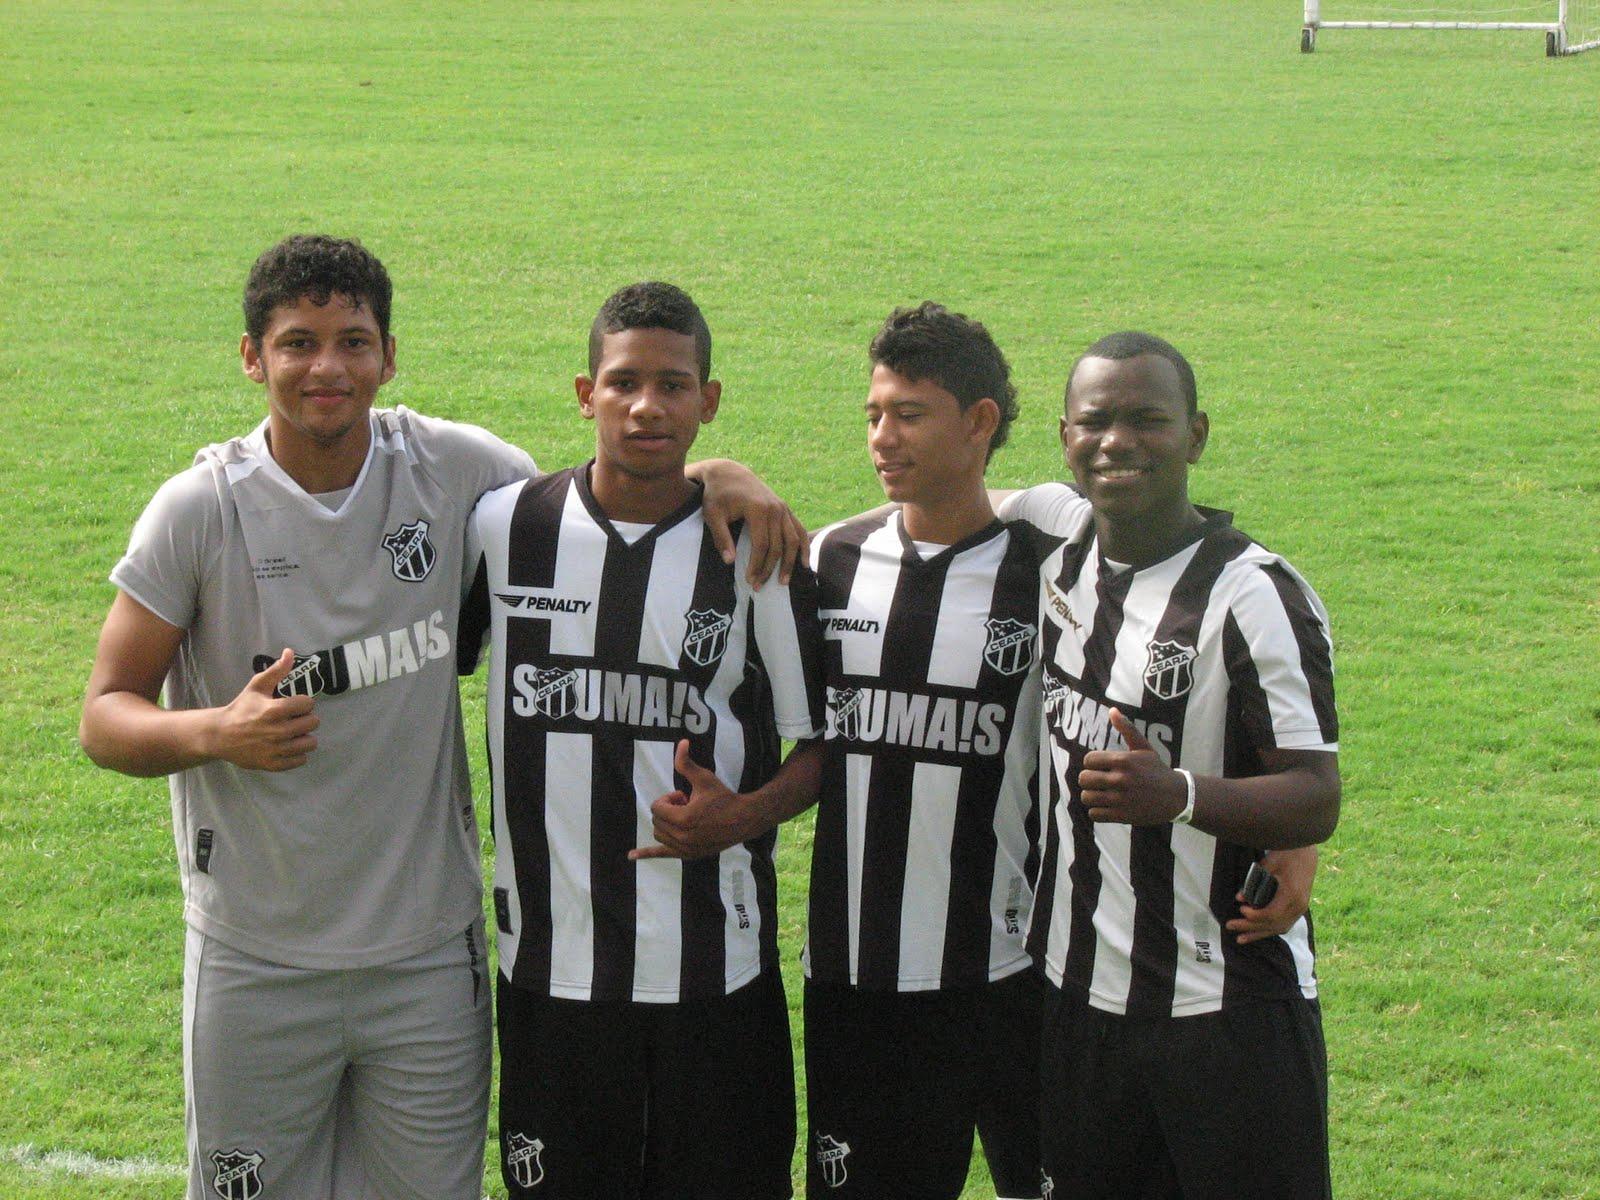 Categoria de Base Cearense: Junho 2011